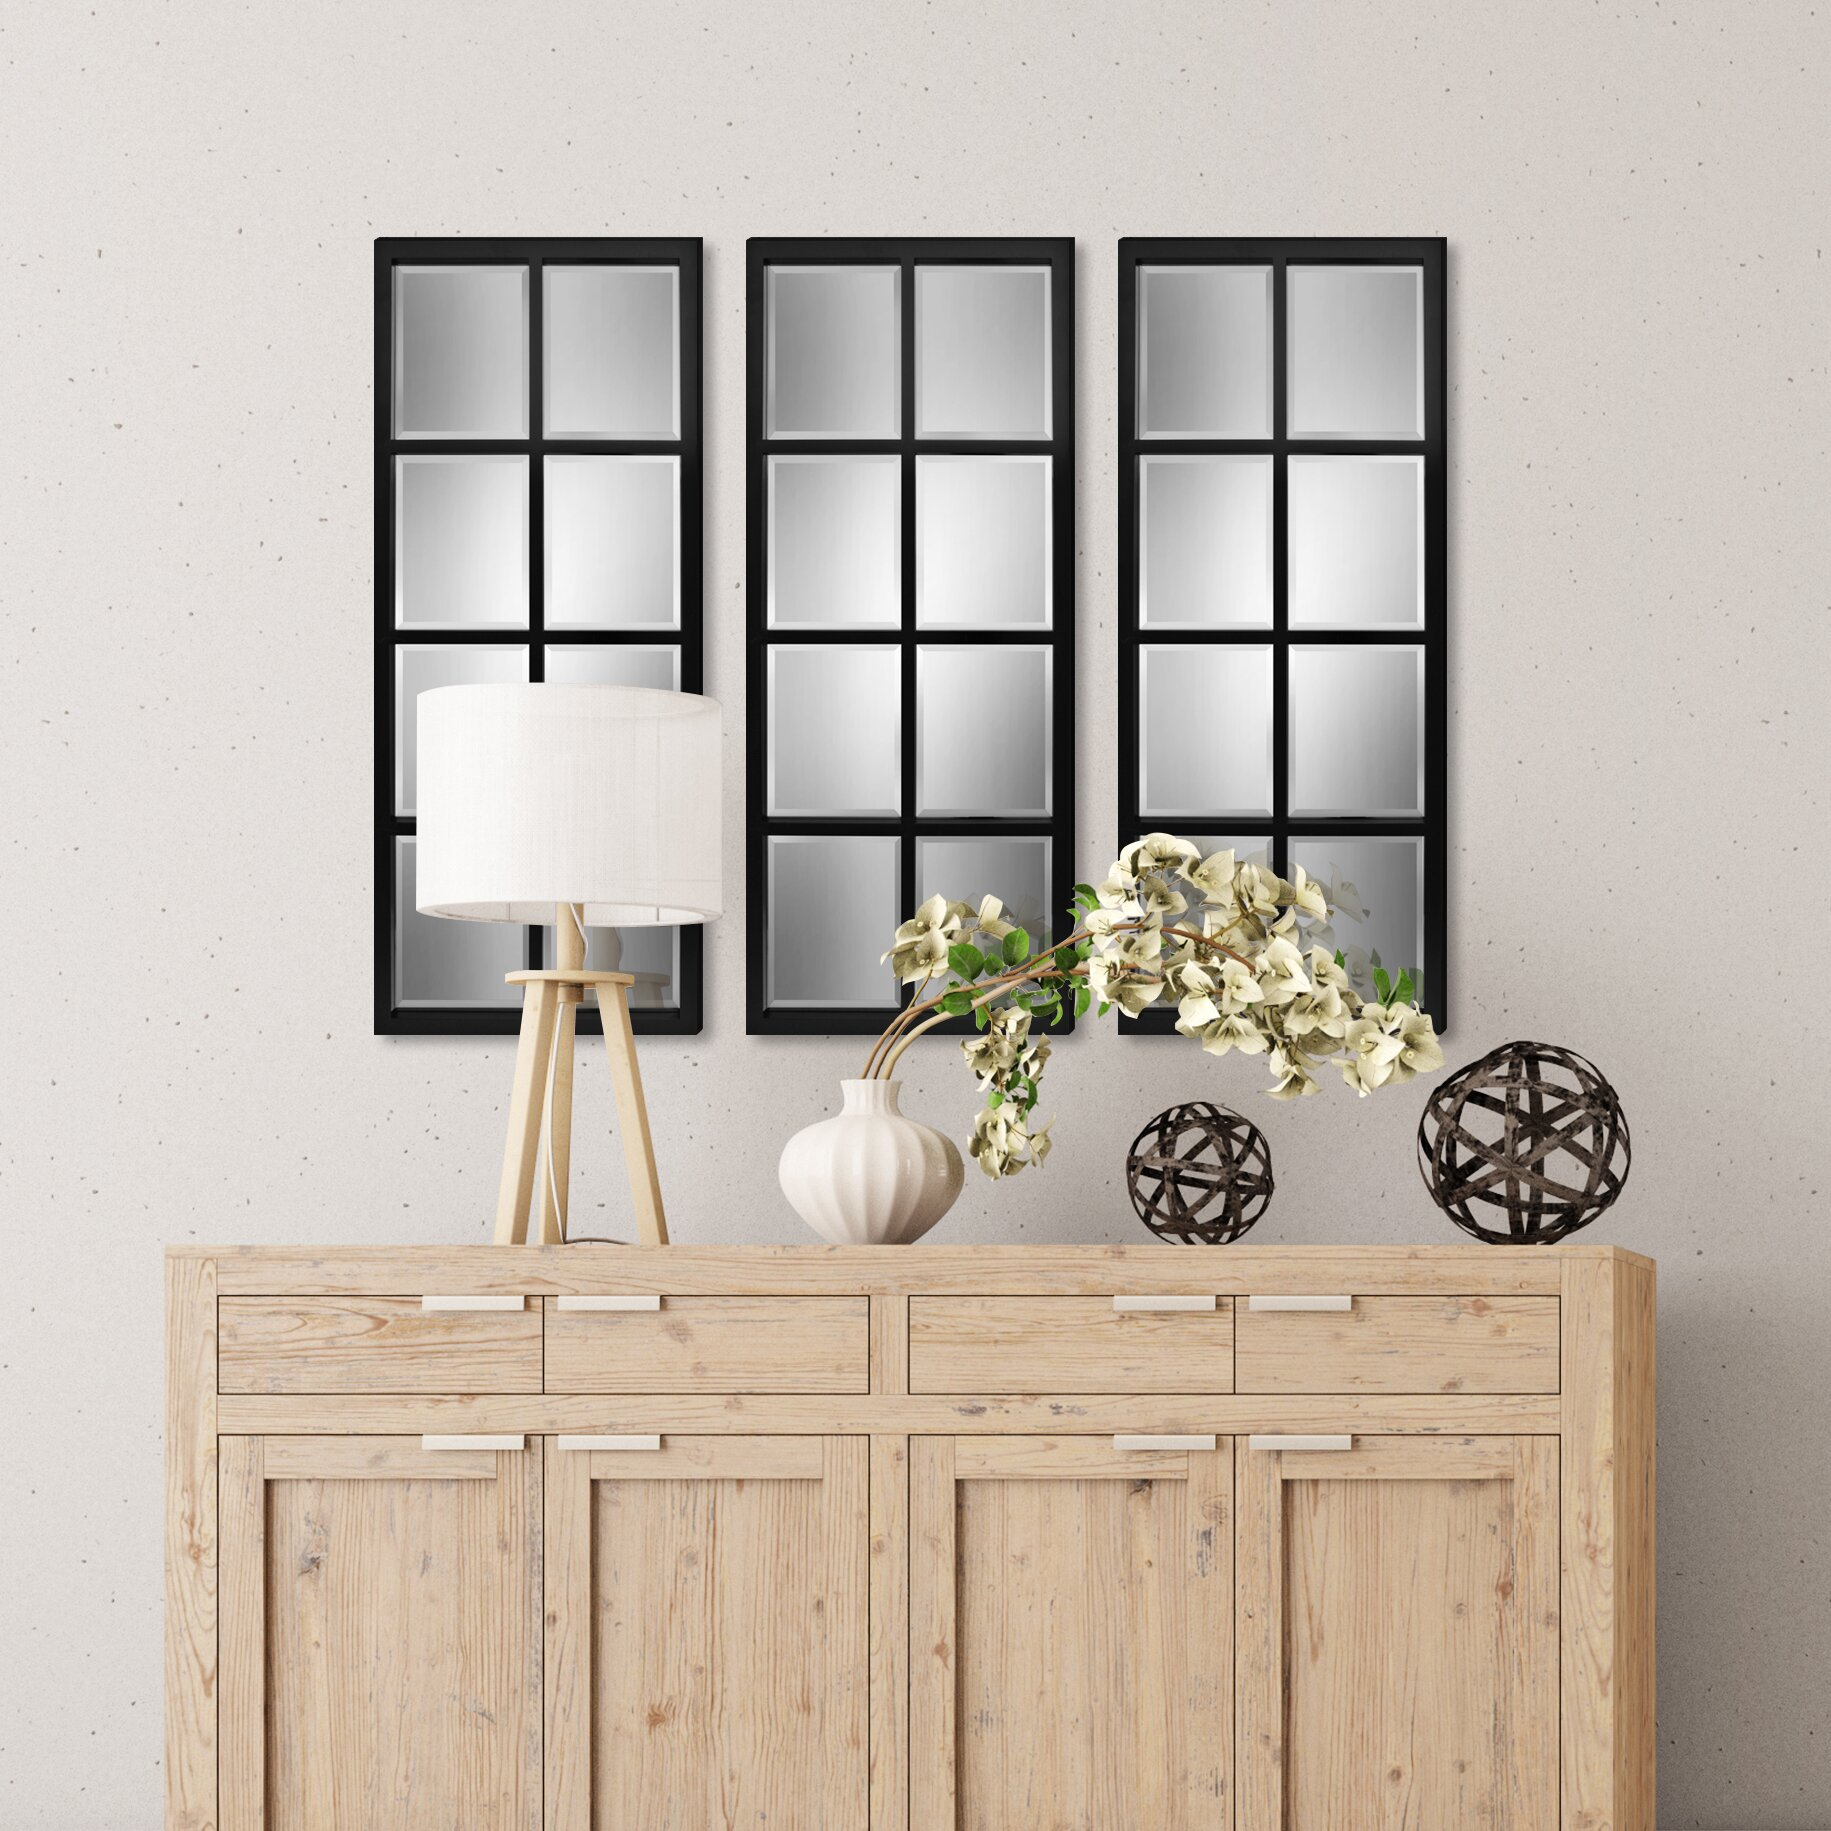 kate and laurel stryker windowpane framed wall mirror